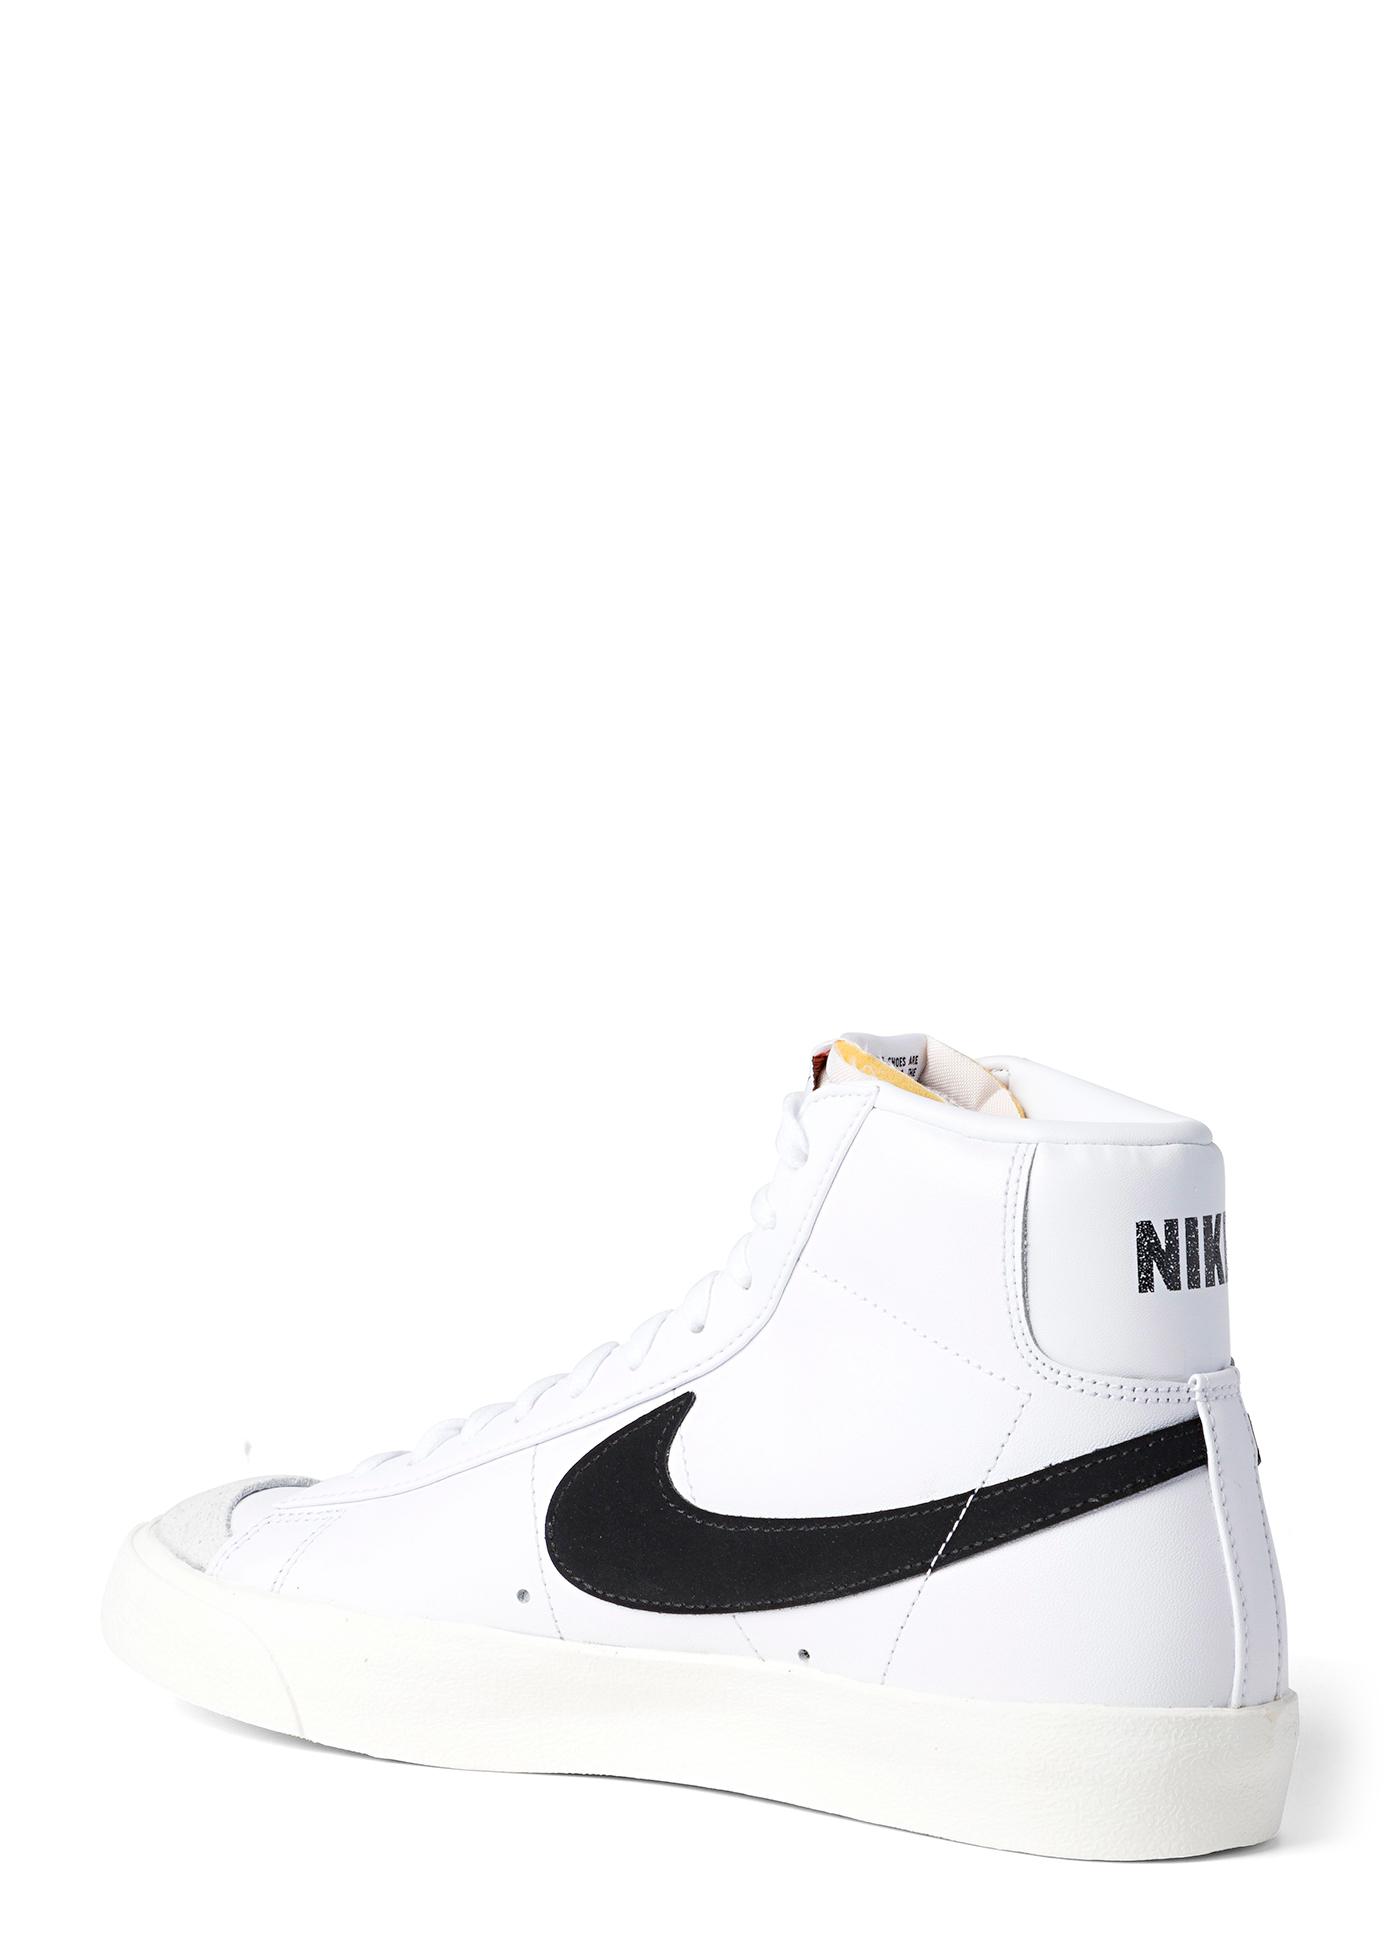 Nike Blazer Mid '77 Vintage image number 2